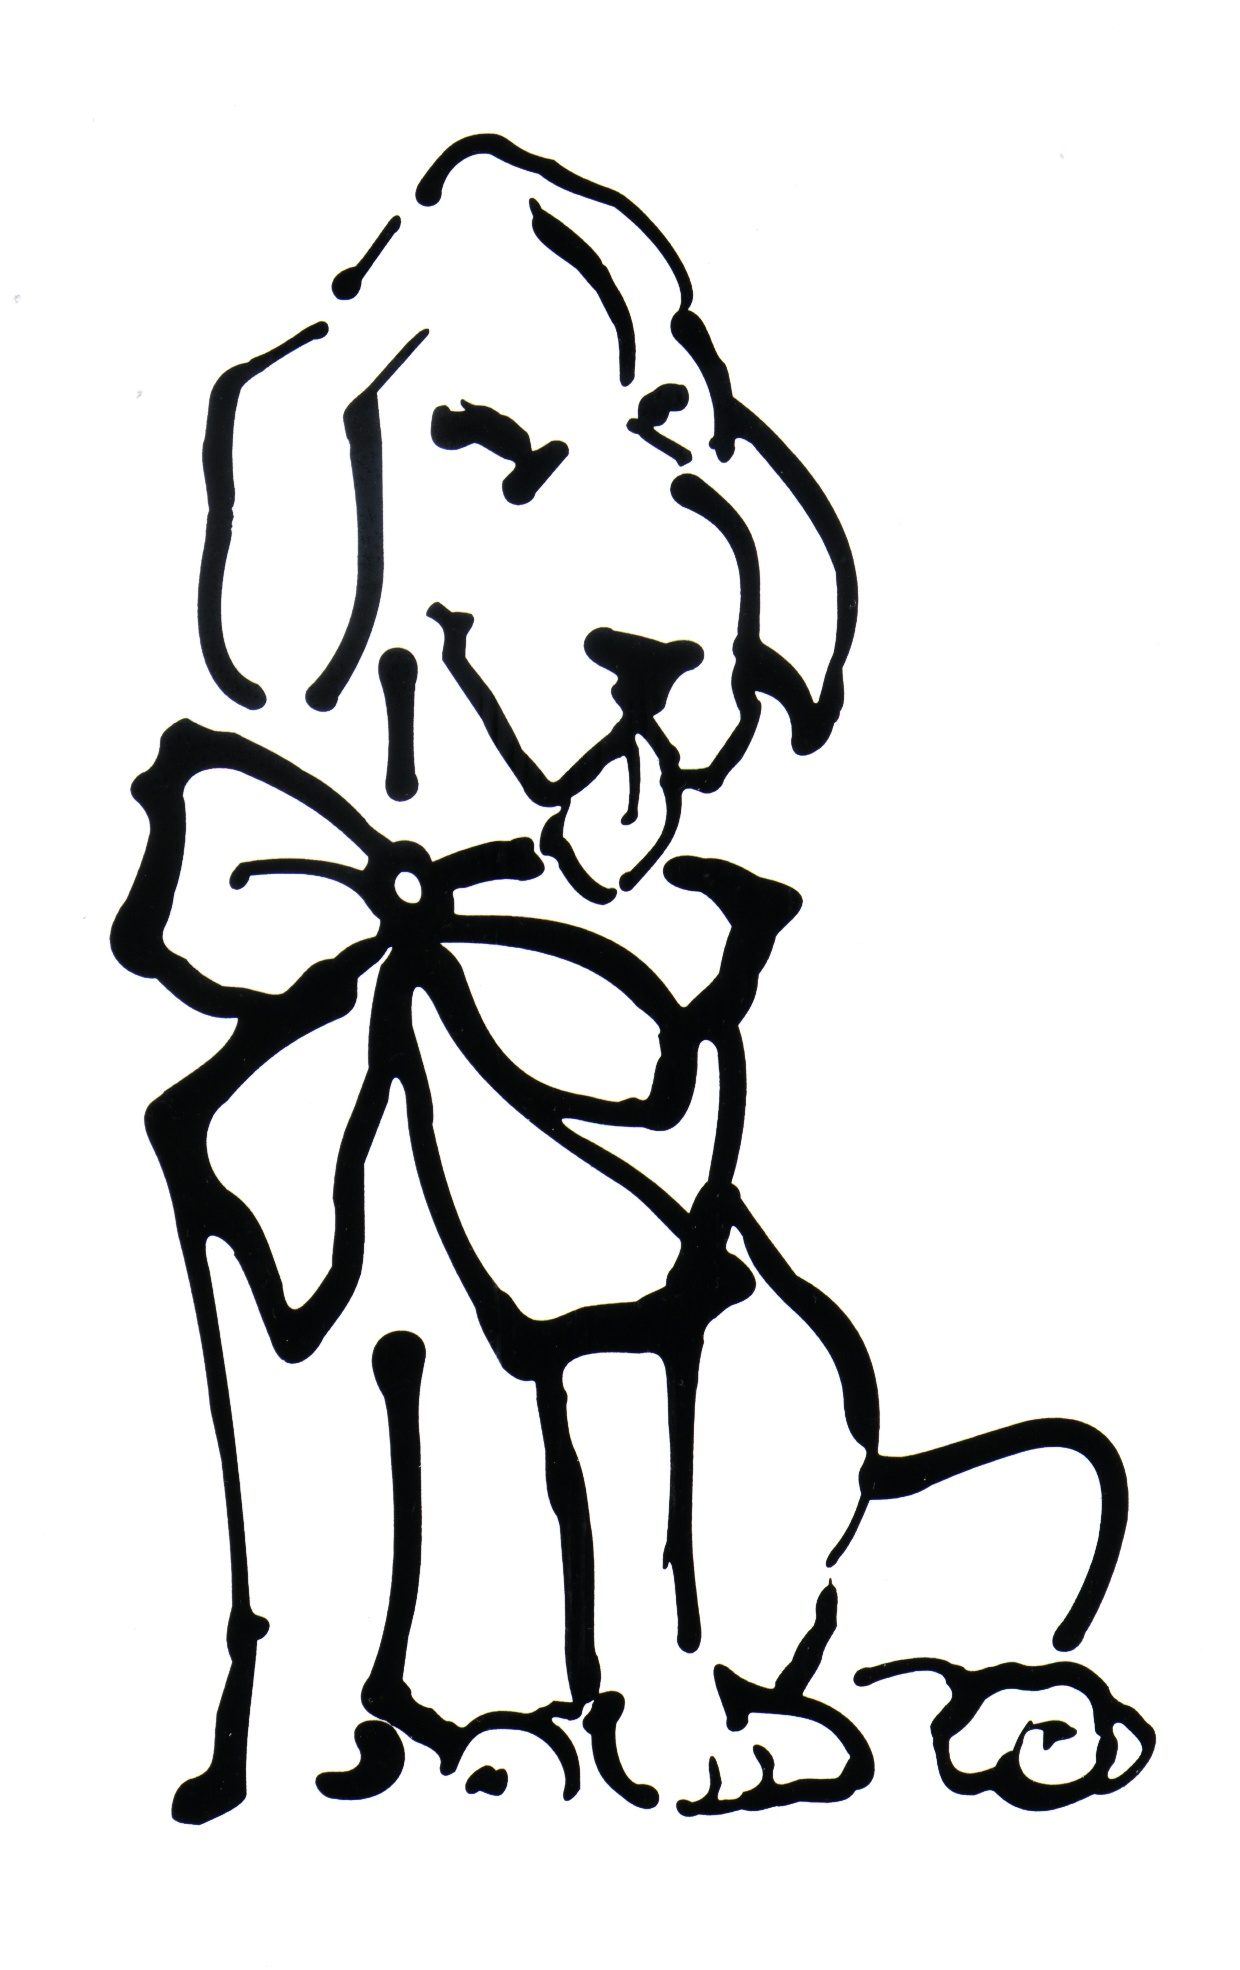 BUDDY, THE GIFT DOG 300 DPI DECEMBER.jpg